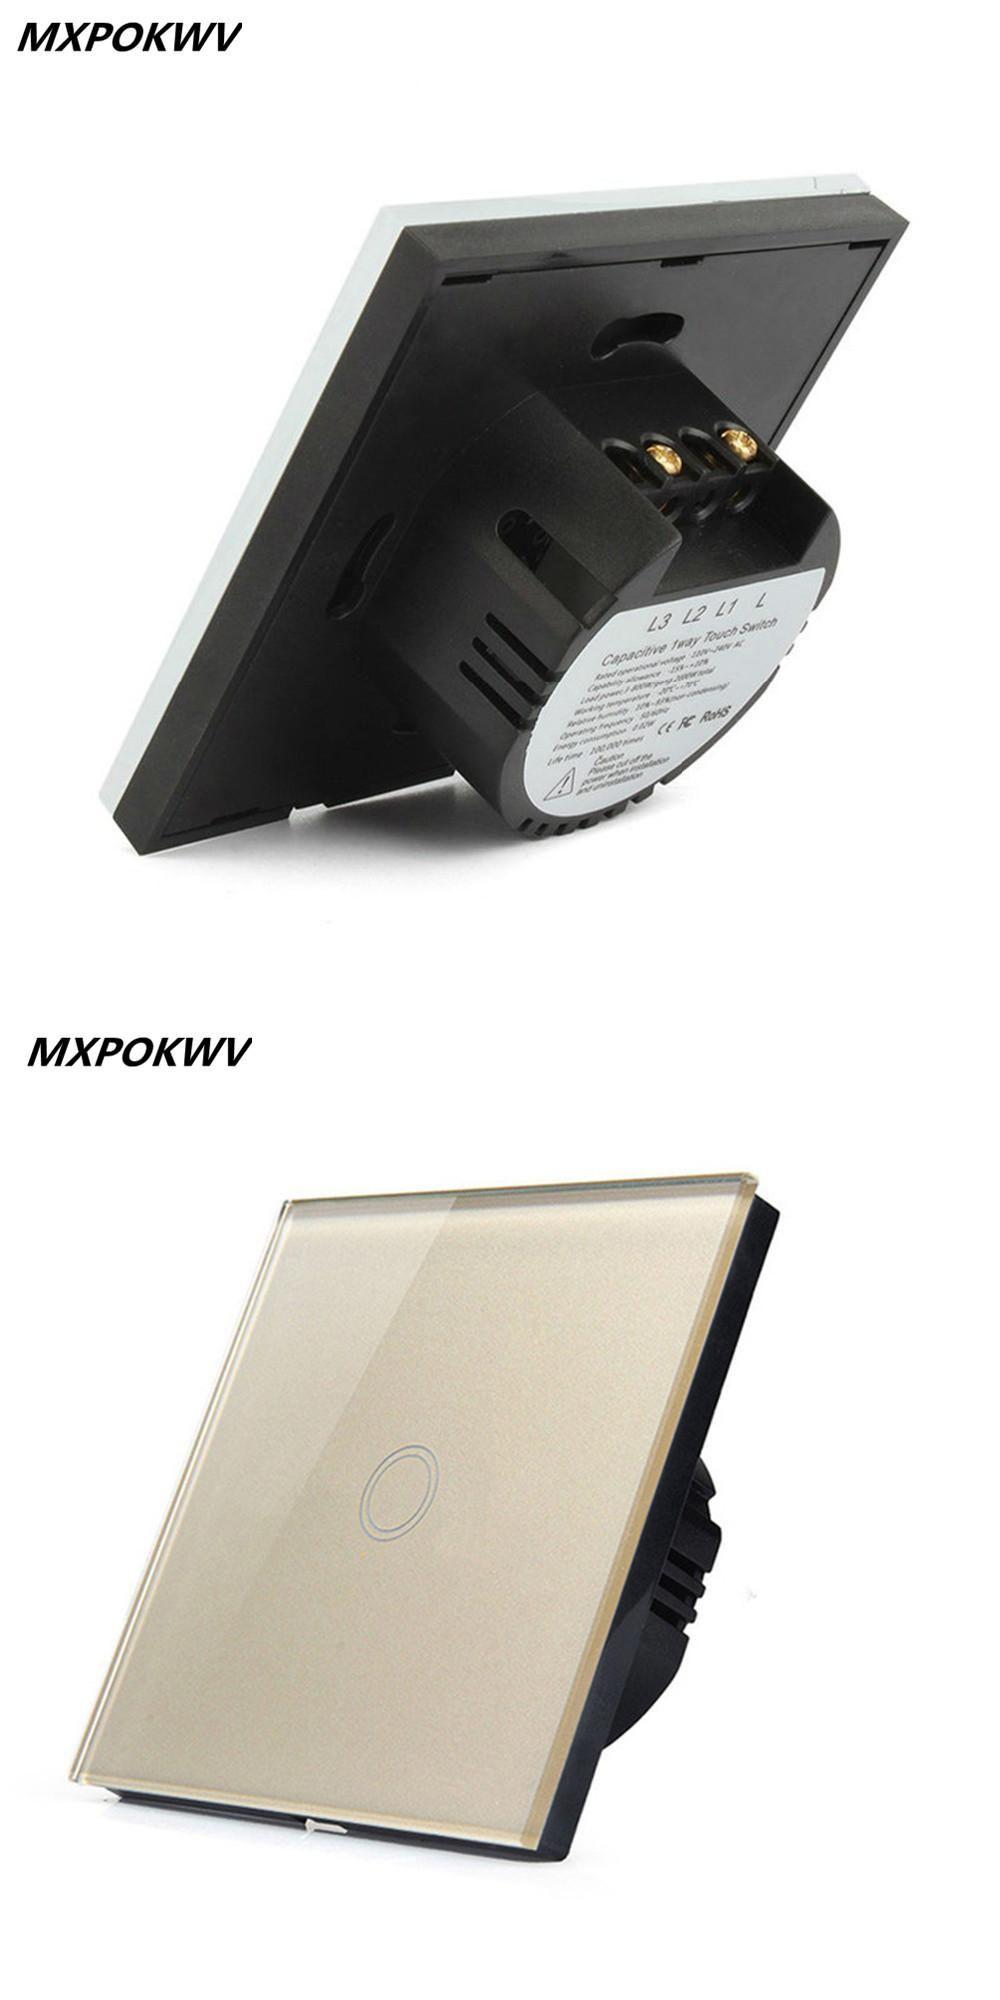 Mxpokwv Eu Standard Crystal Glass Switch 1 Gang Way Smart Home 4 Light Wall Touch